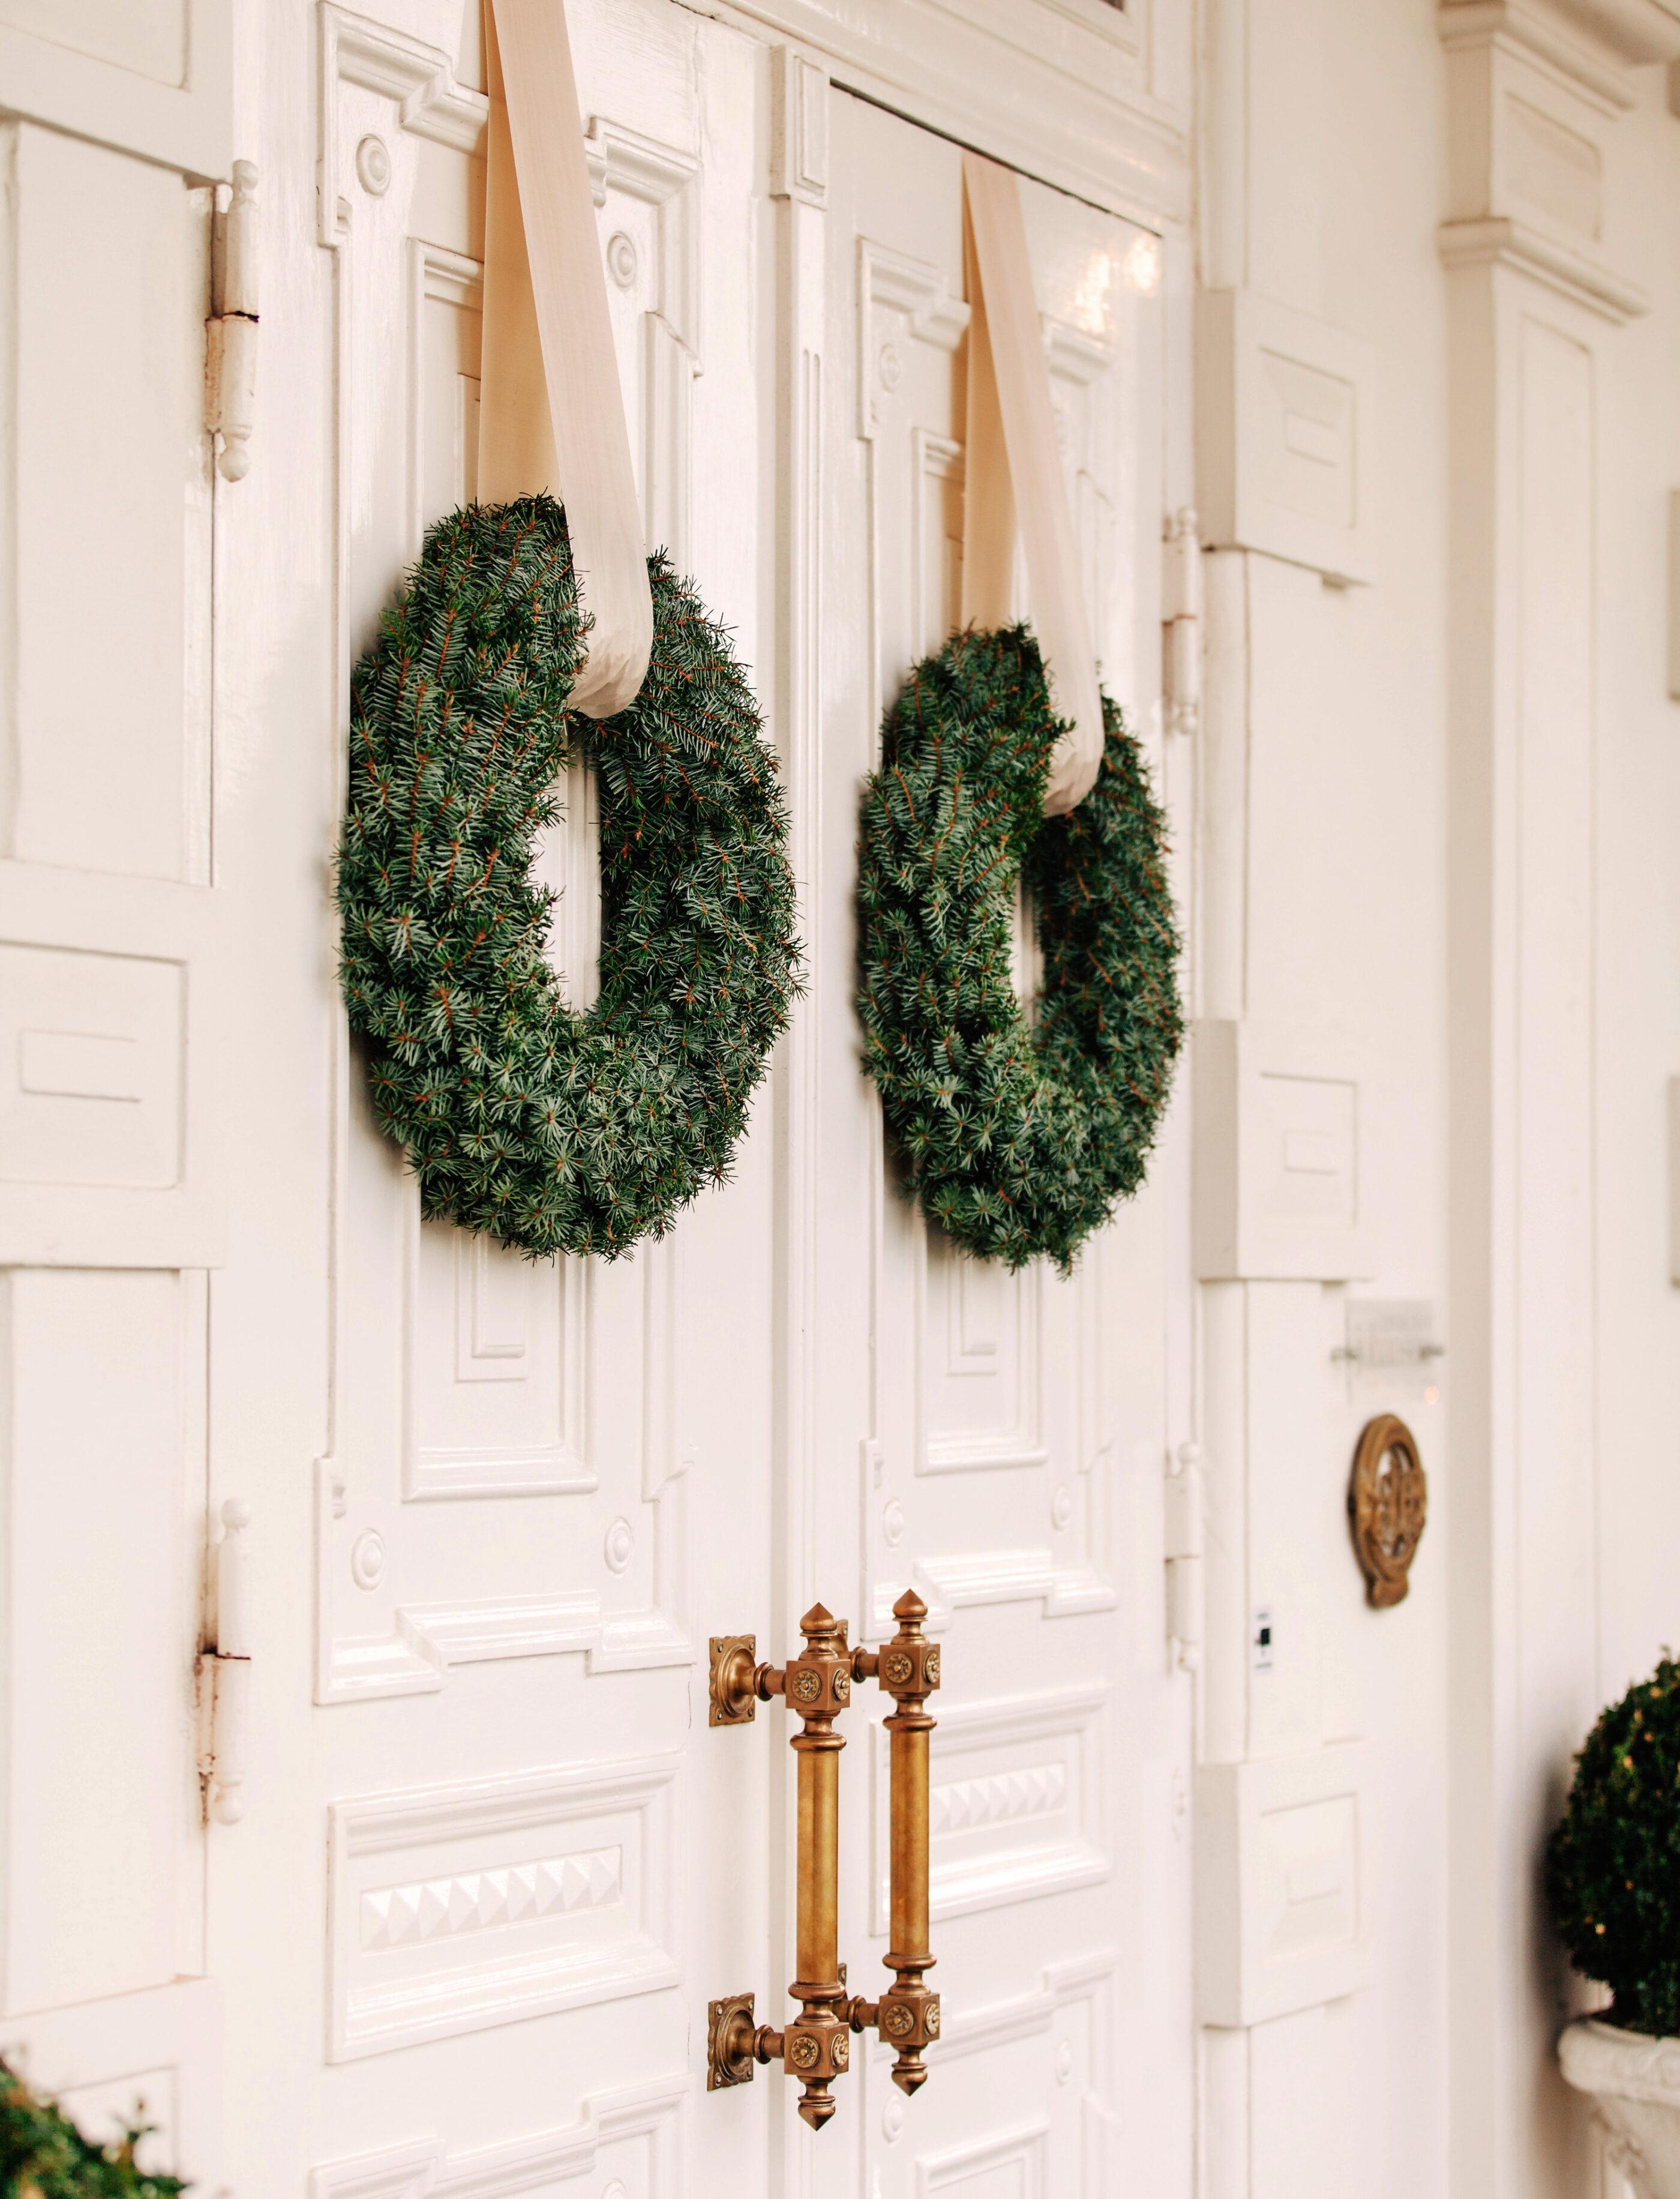 Hoteldøre med juledekoration